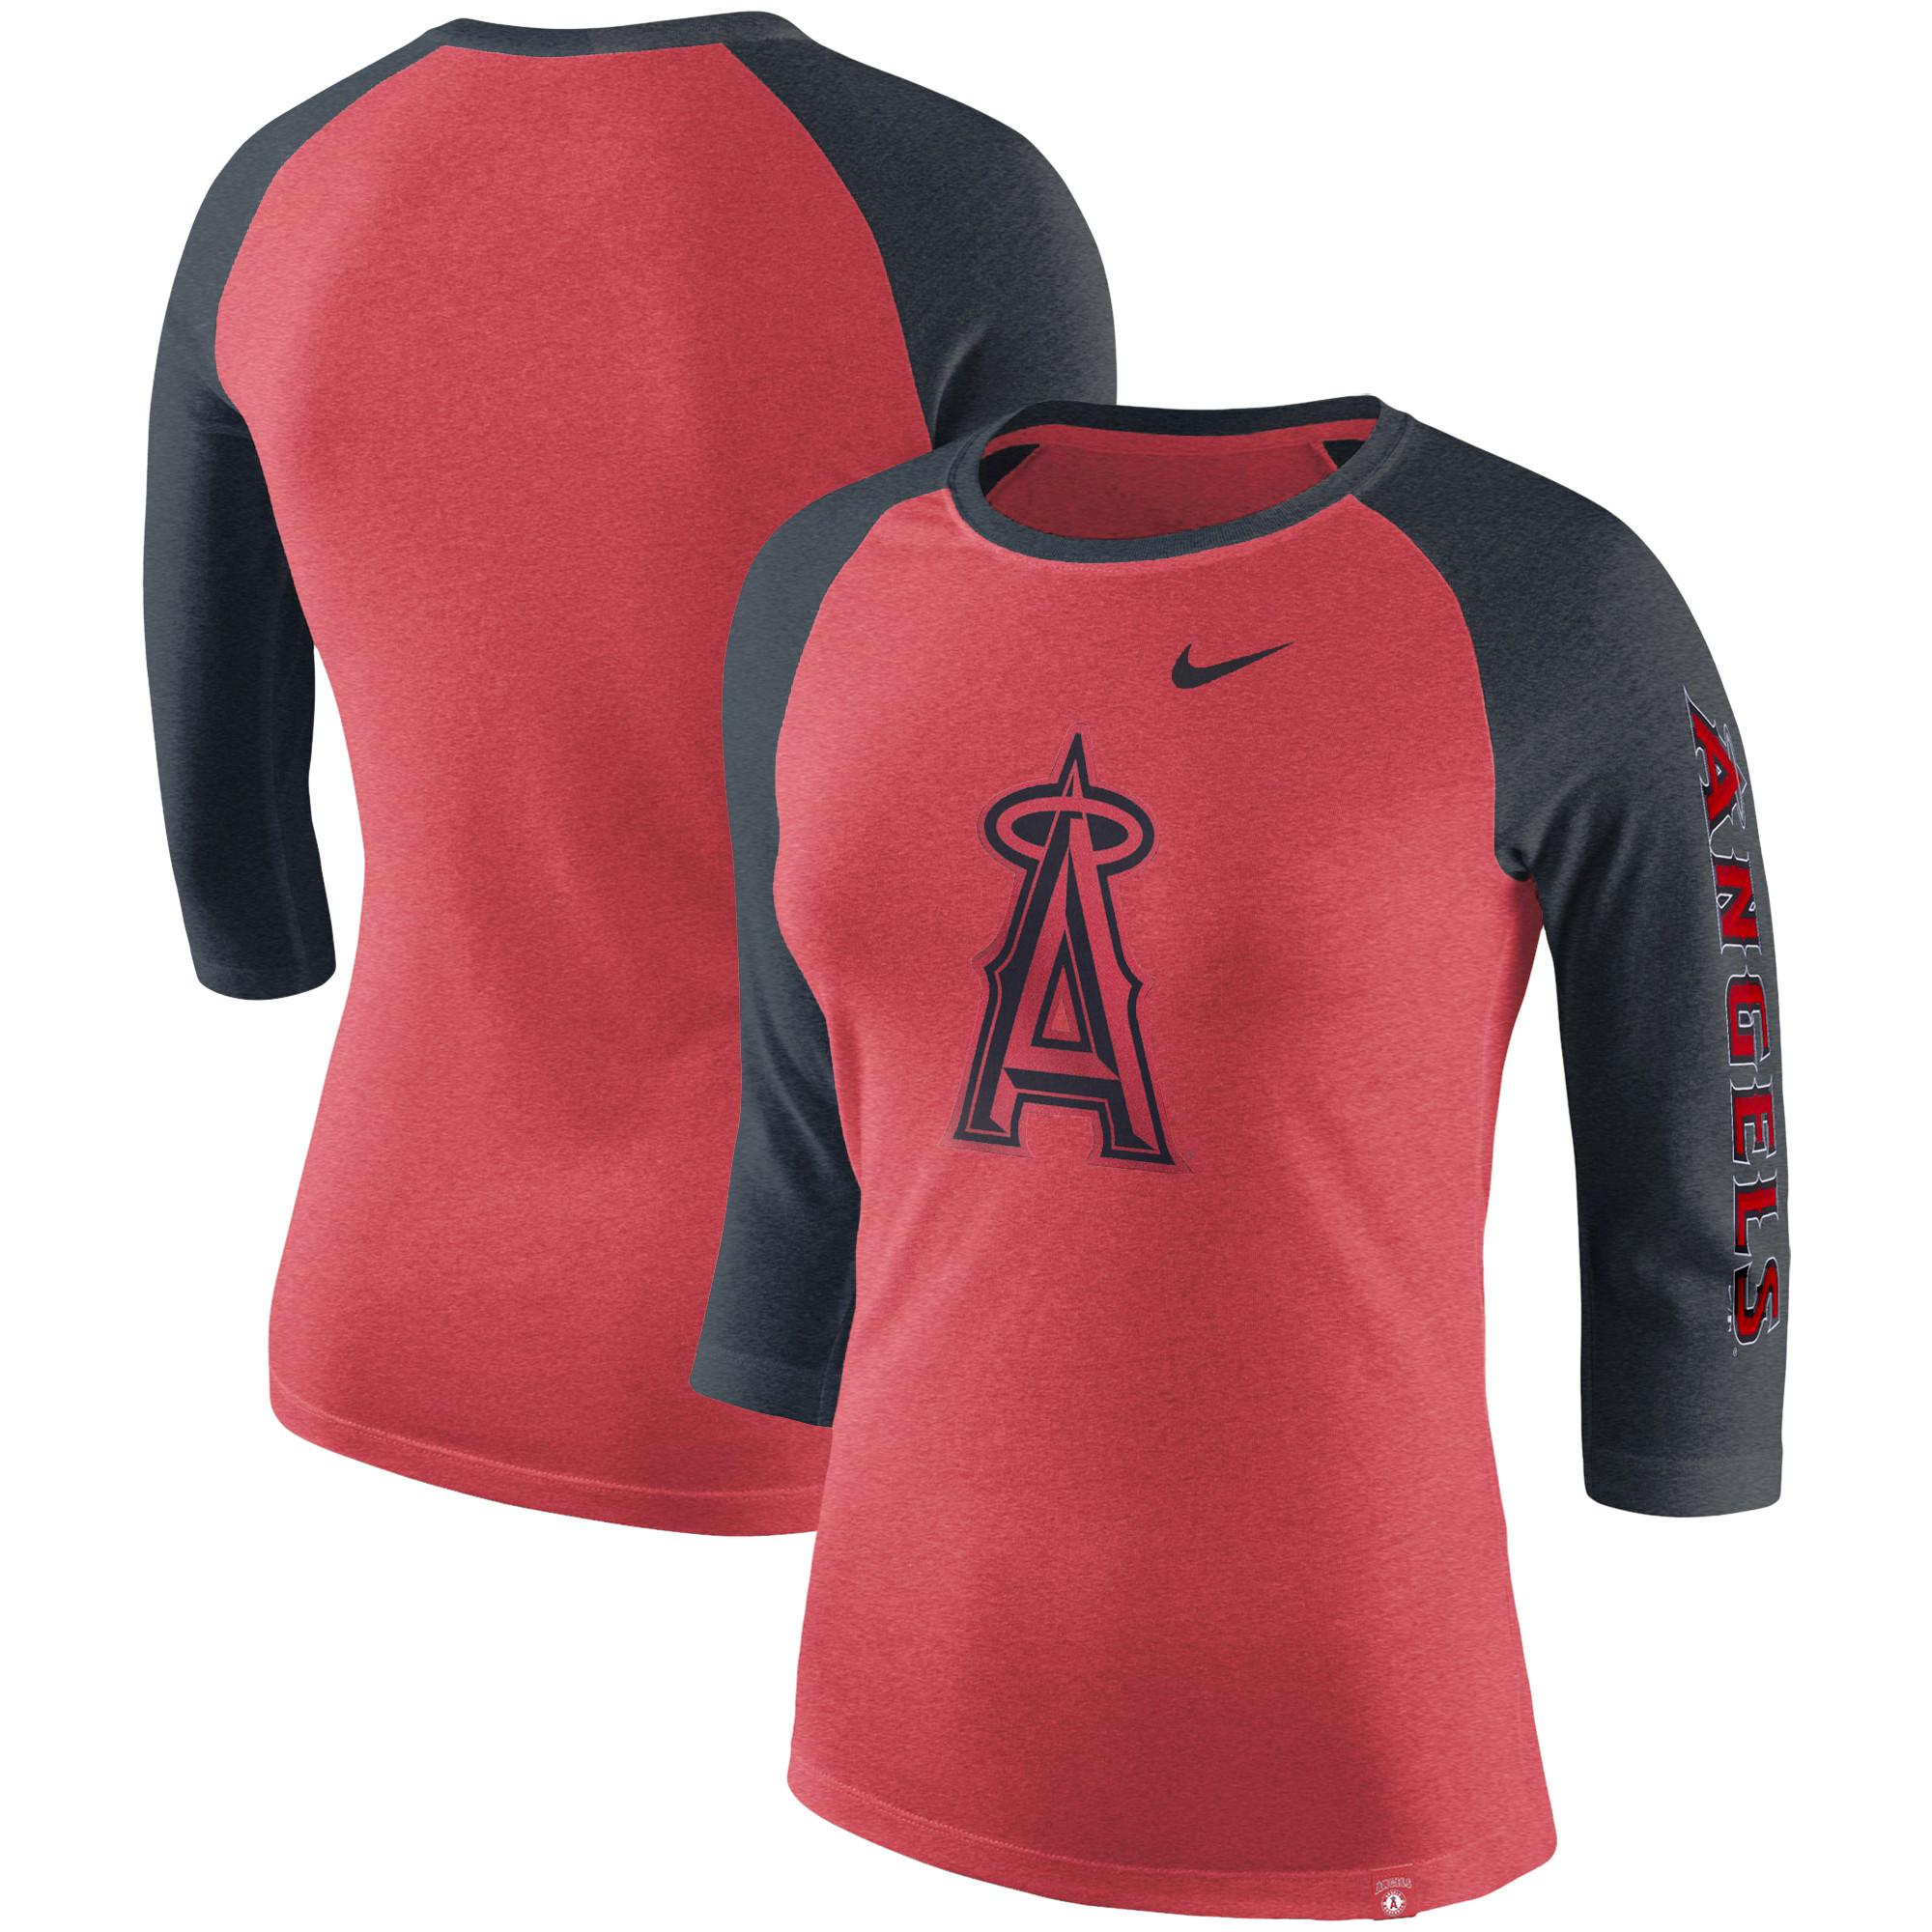 Los Angeles Angels Nike Women's Tri-Blend 3/4-Sleeve Raglan T-Shirt - Heathered Red/Heathered Navy